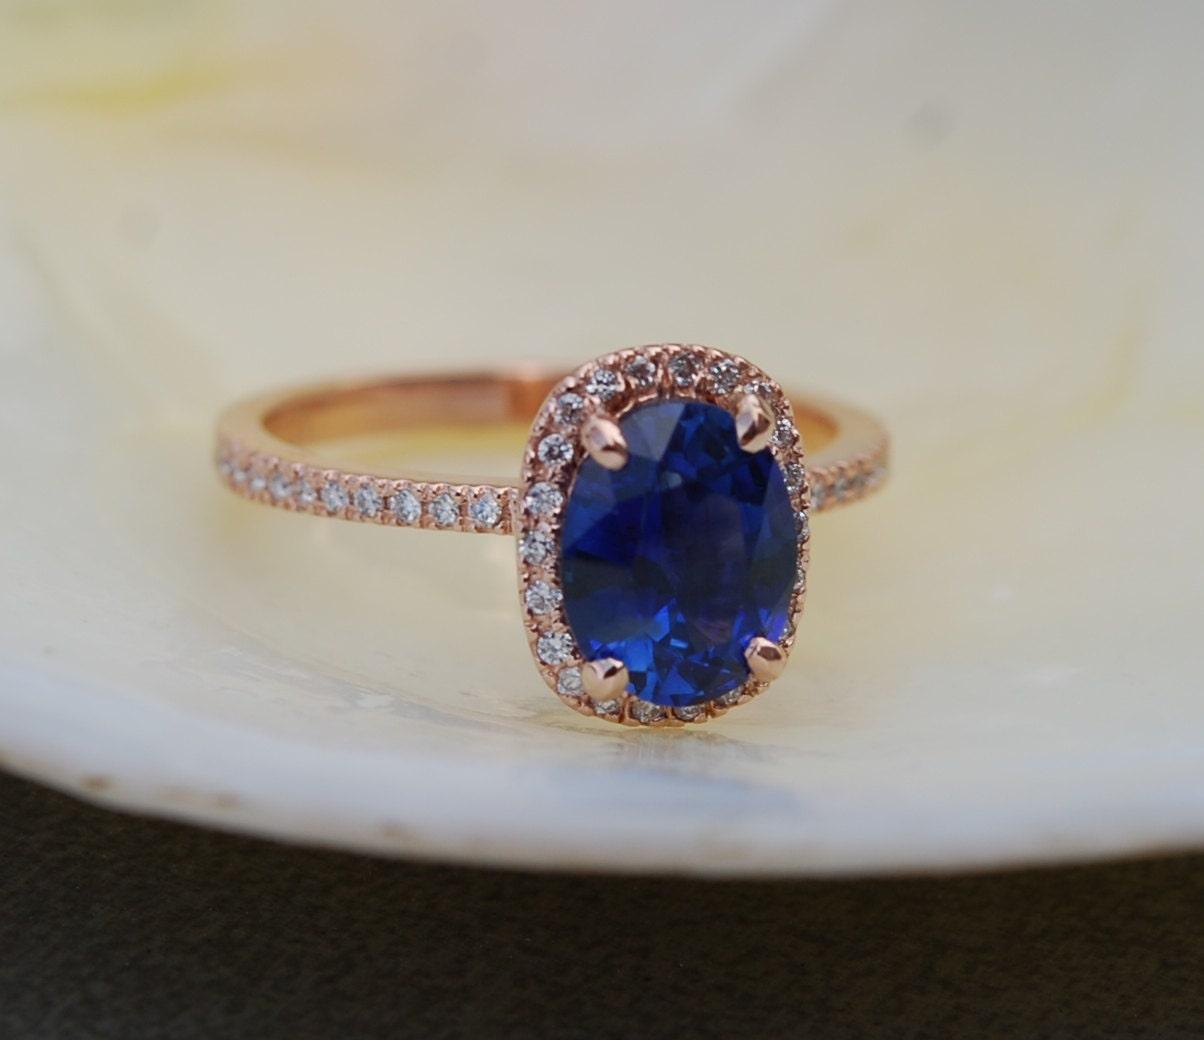 Popular Rose gold sapphire ring. 2.57ct Royal blue sapphire diamond ring  TI51